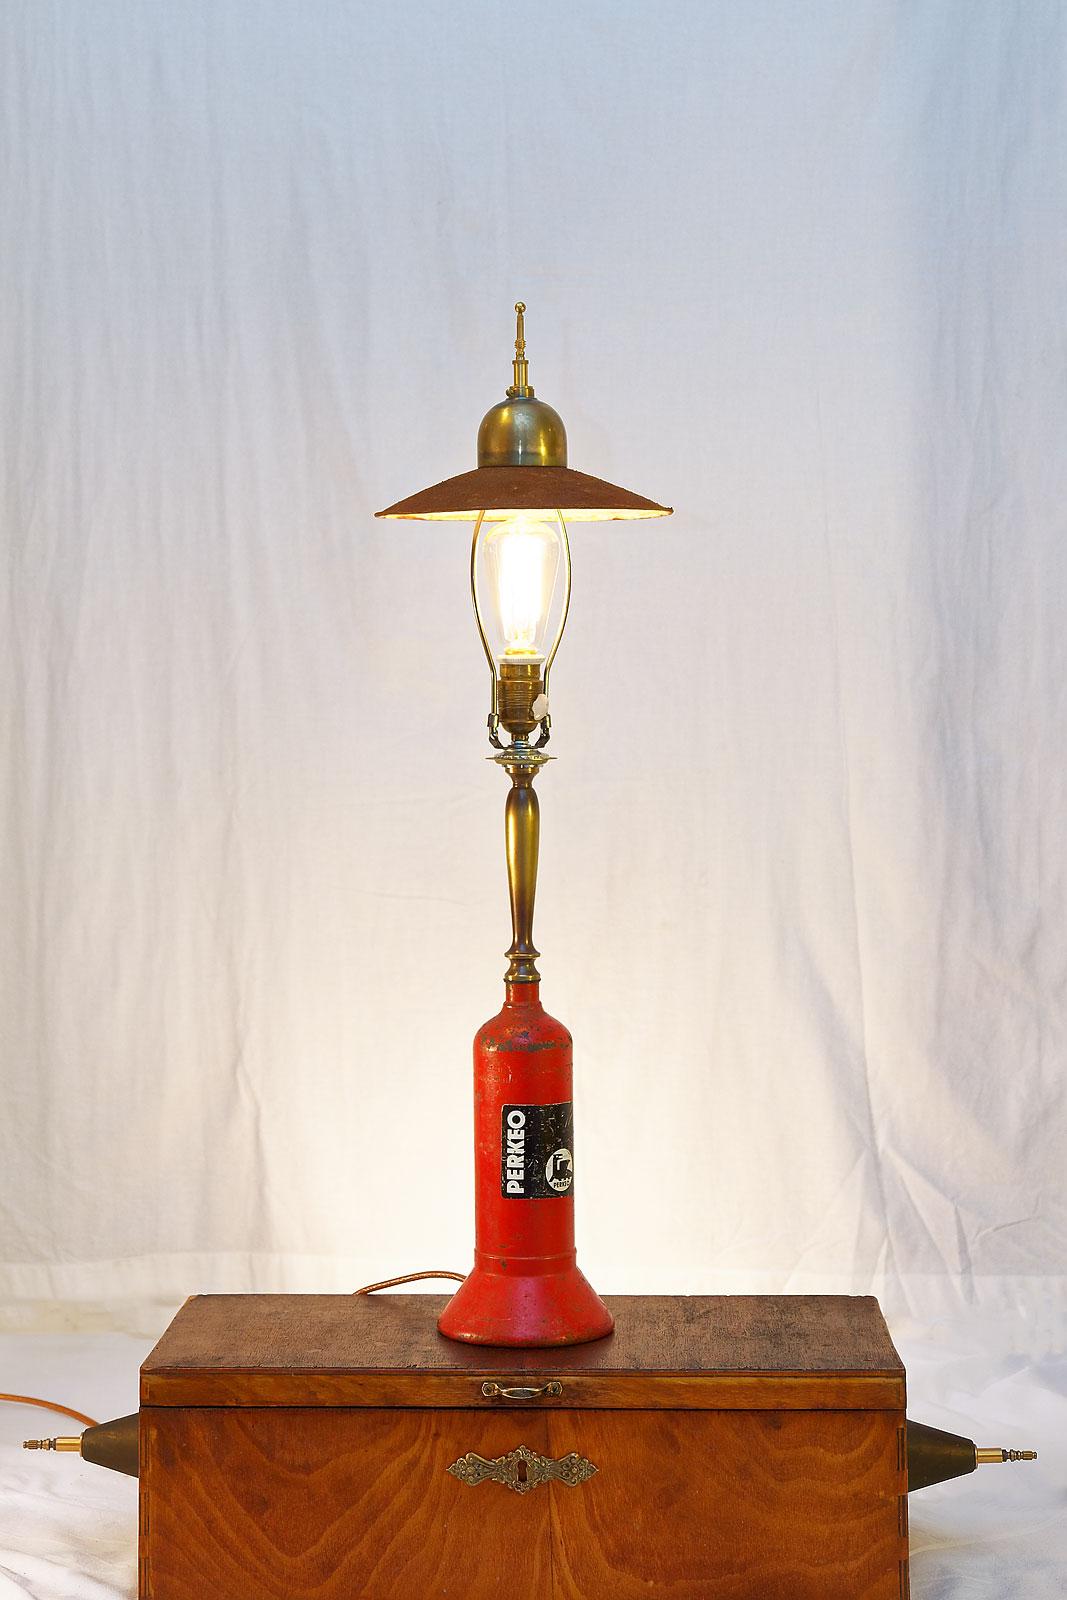 Steampunk table lamp. Vintage. Industrial design. Interior Design.